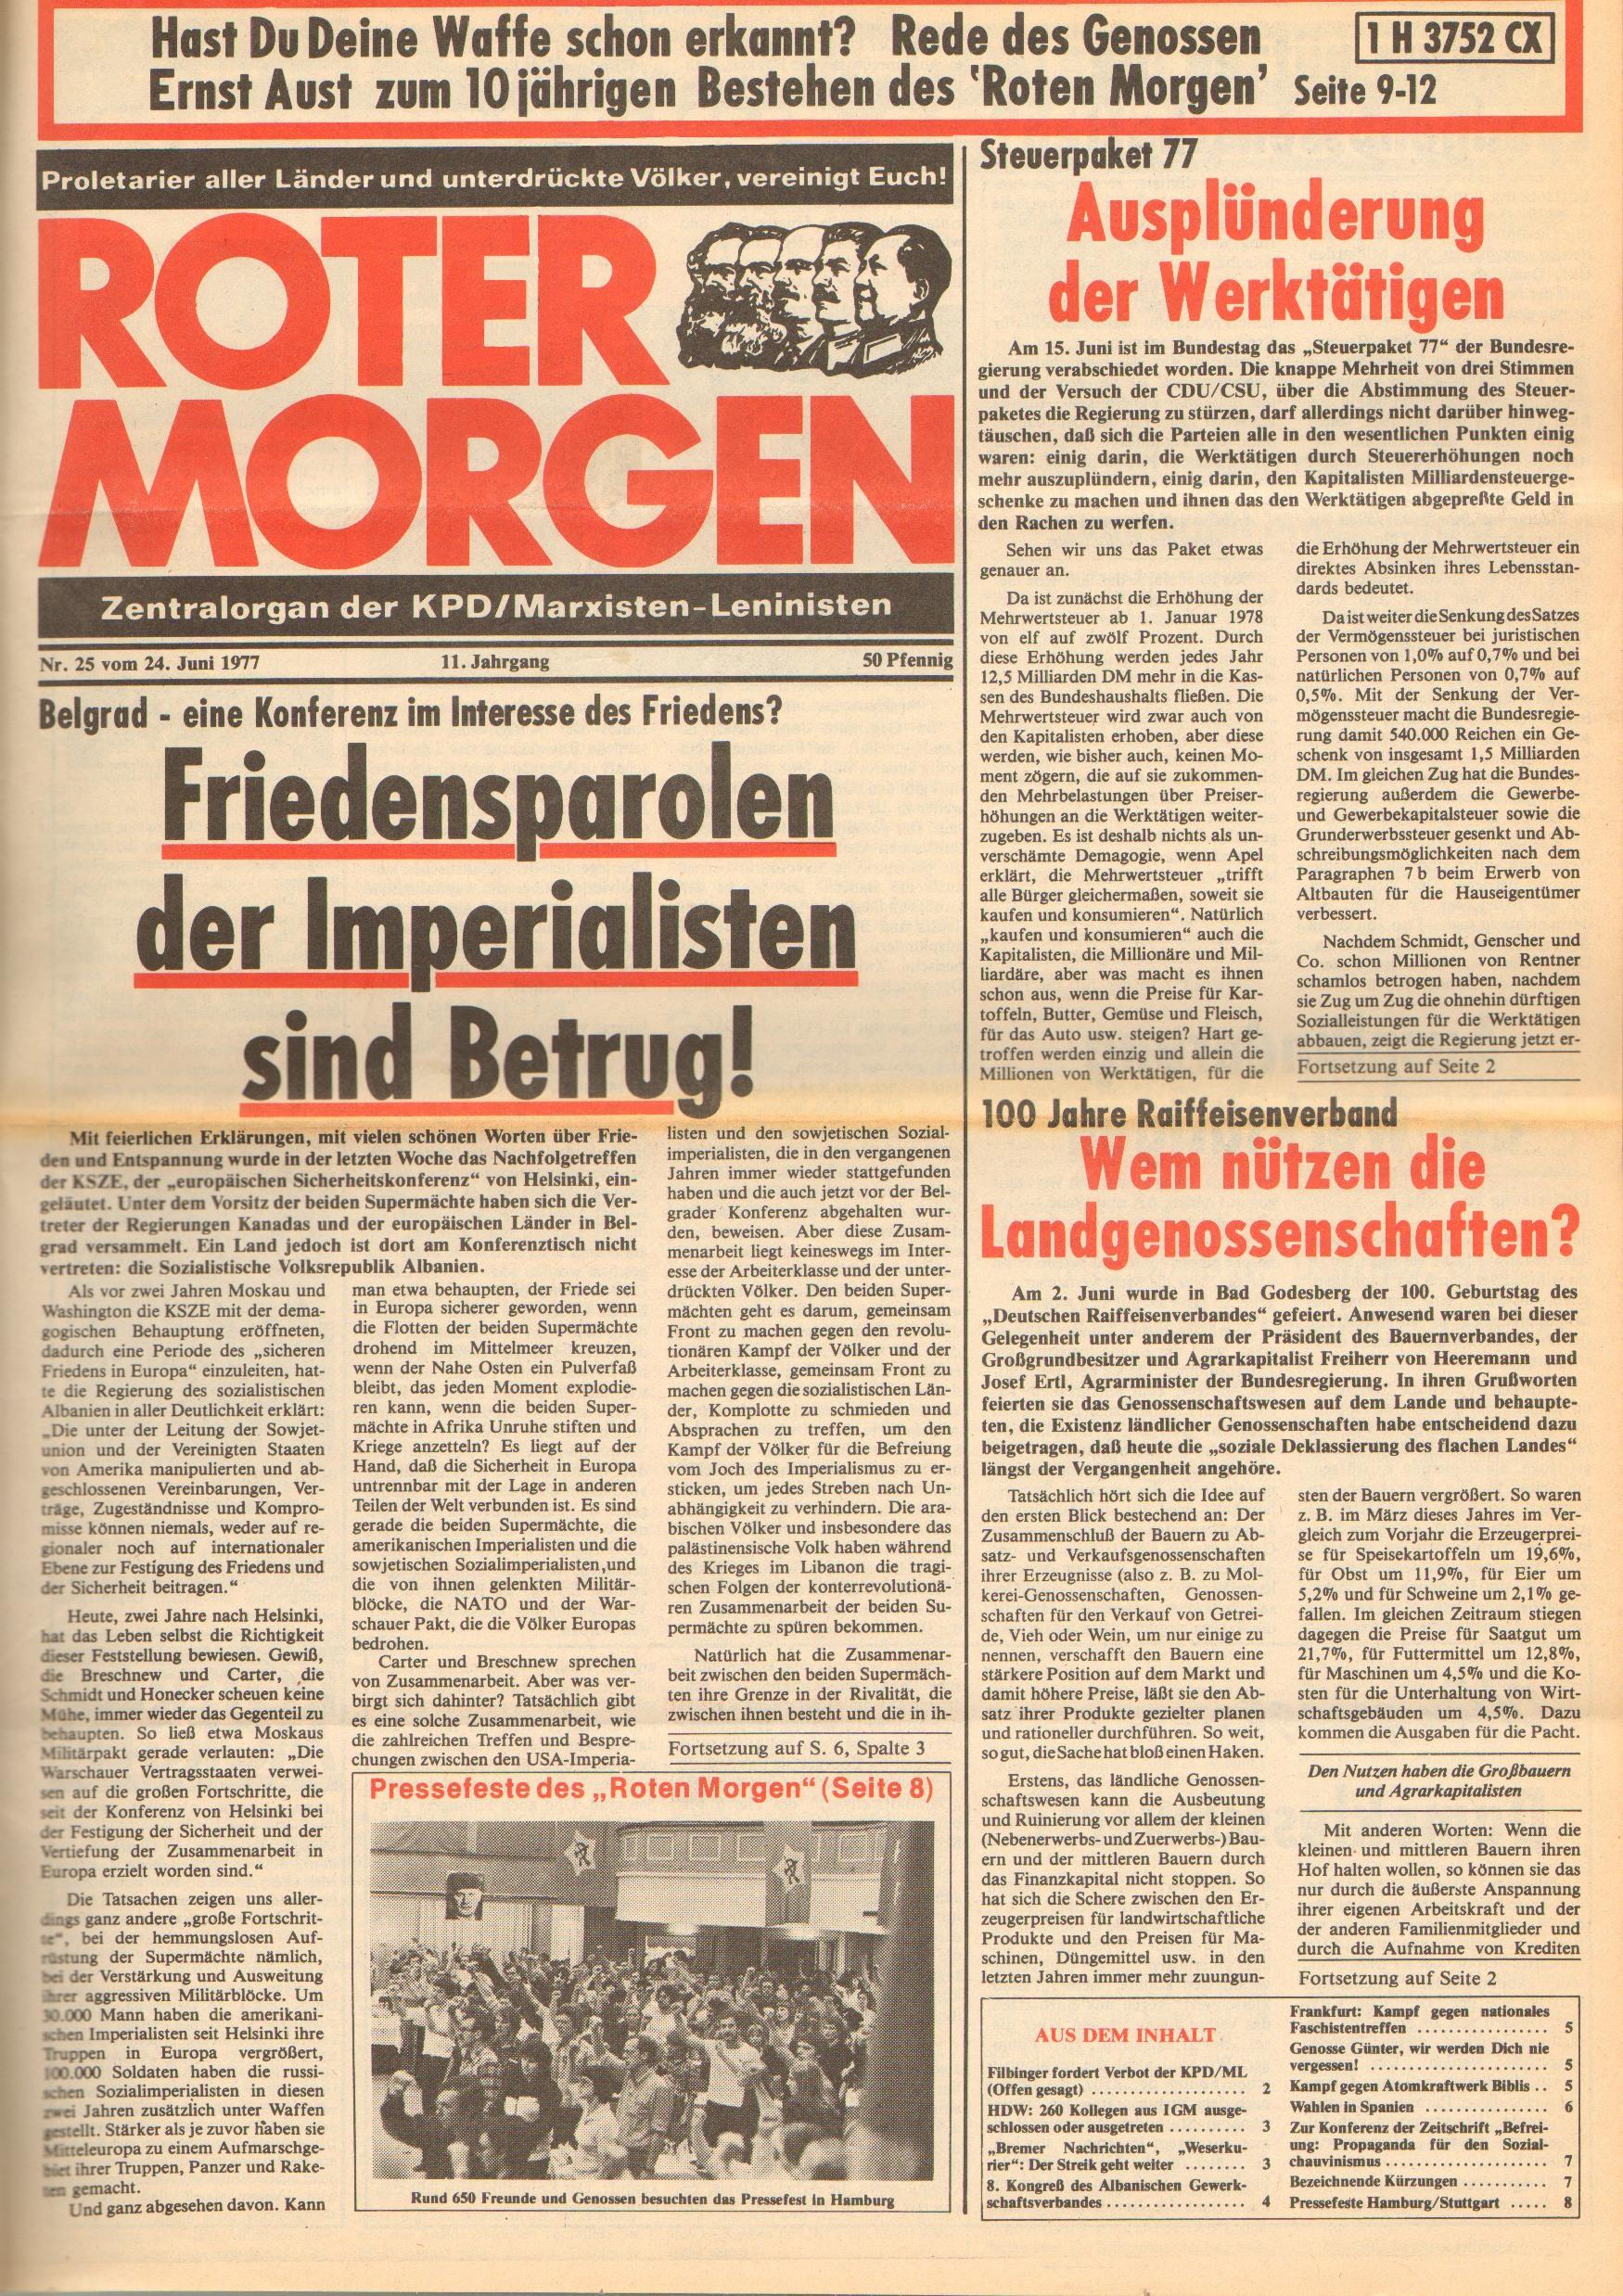 Roter Morgen, 11. Jg., 24. Juni 1977, Nr. 25, Seite 1